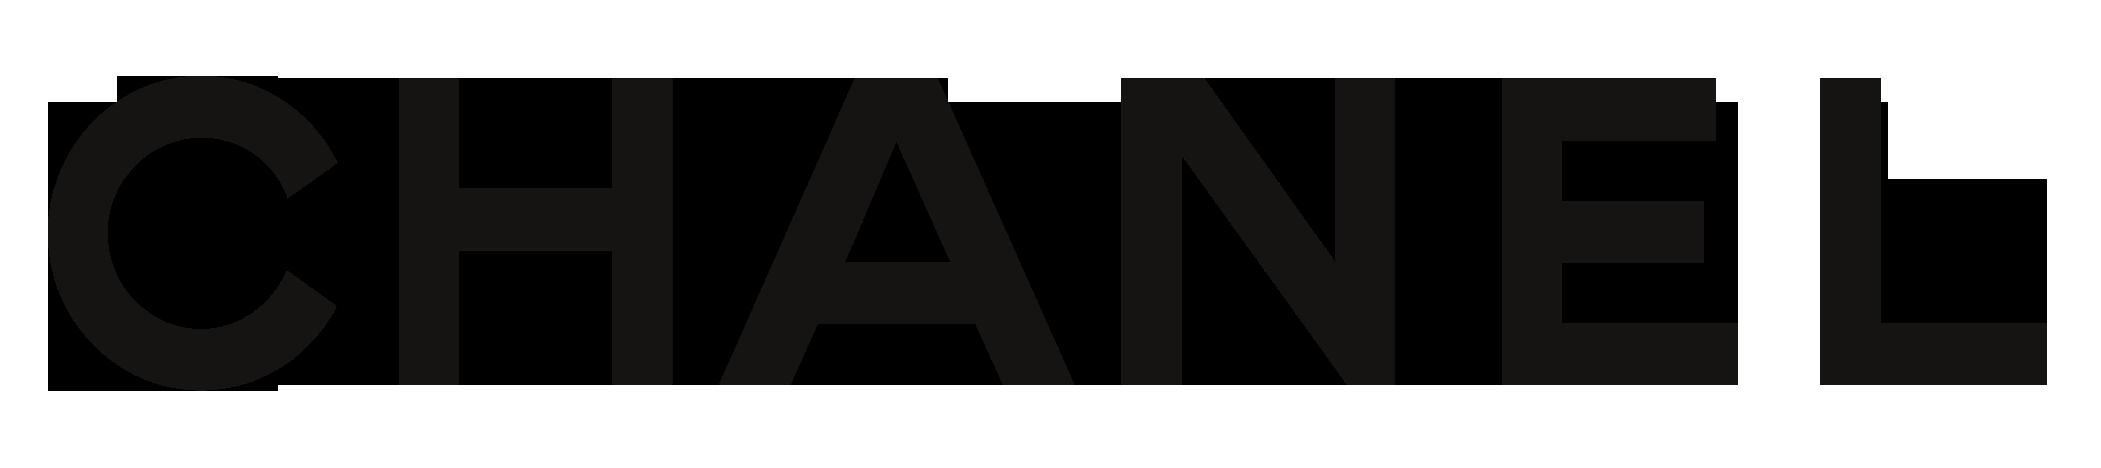 Chanel-logo-wordmark